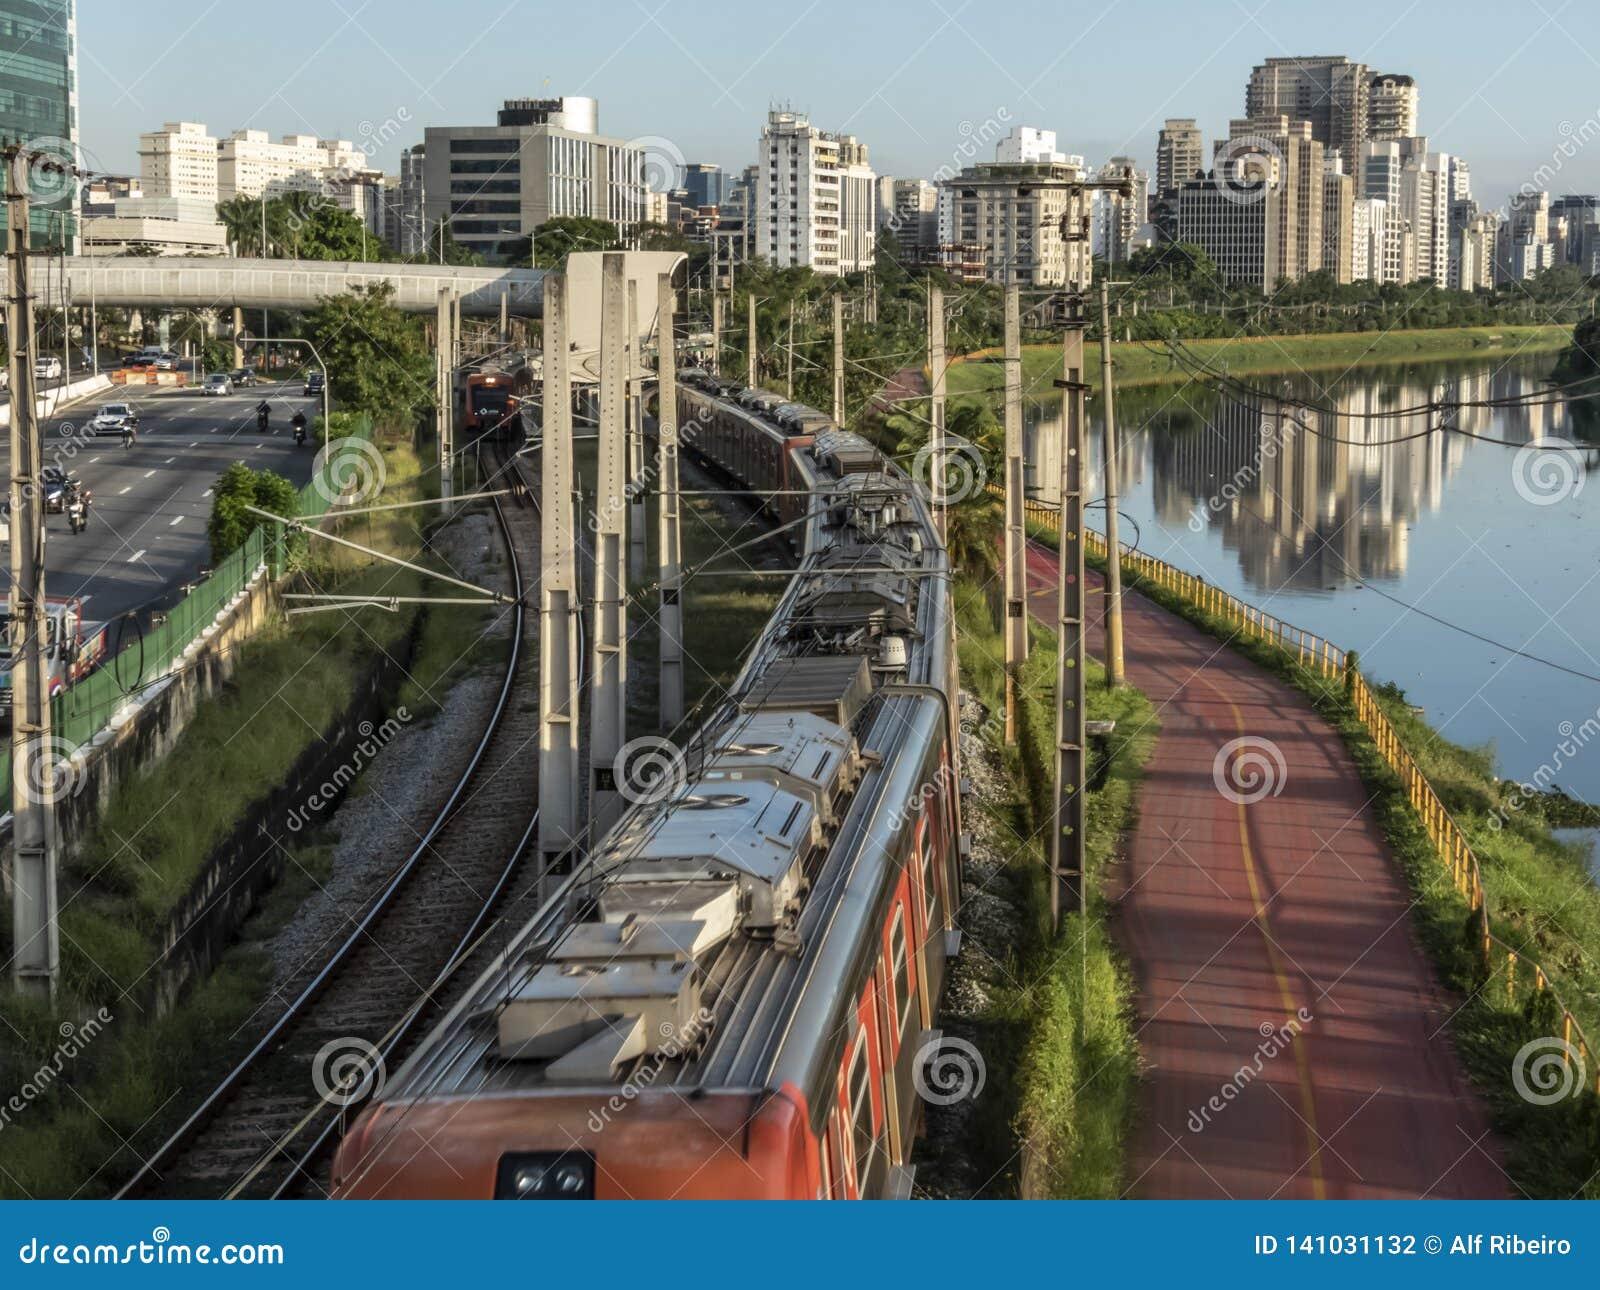 Sikt av byggnader, CPTM-drevet, trafik av medel och floden i marginell Pinheiros flodaveny